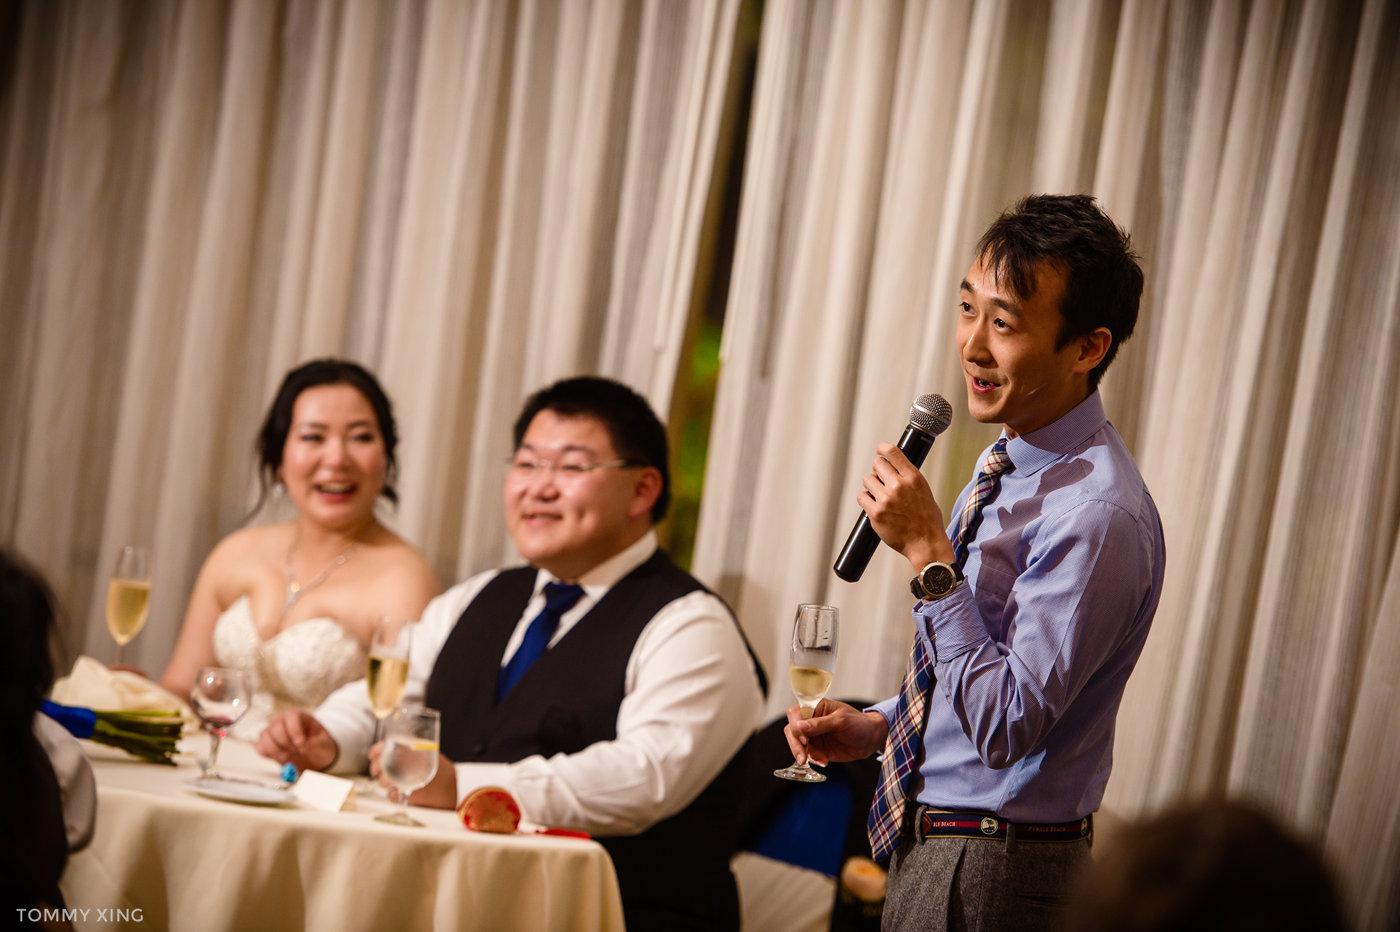 STANFORD MEMORIAL CHURCH WEDDING - Wenjie & Chengcheng - SAN FRANCISCO BAY AREA 斯坦福教堂婚礼跟拍 - 洛杉矶婚礼婚纱照摄影师 Tommy Xing Photography217.jpg